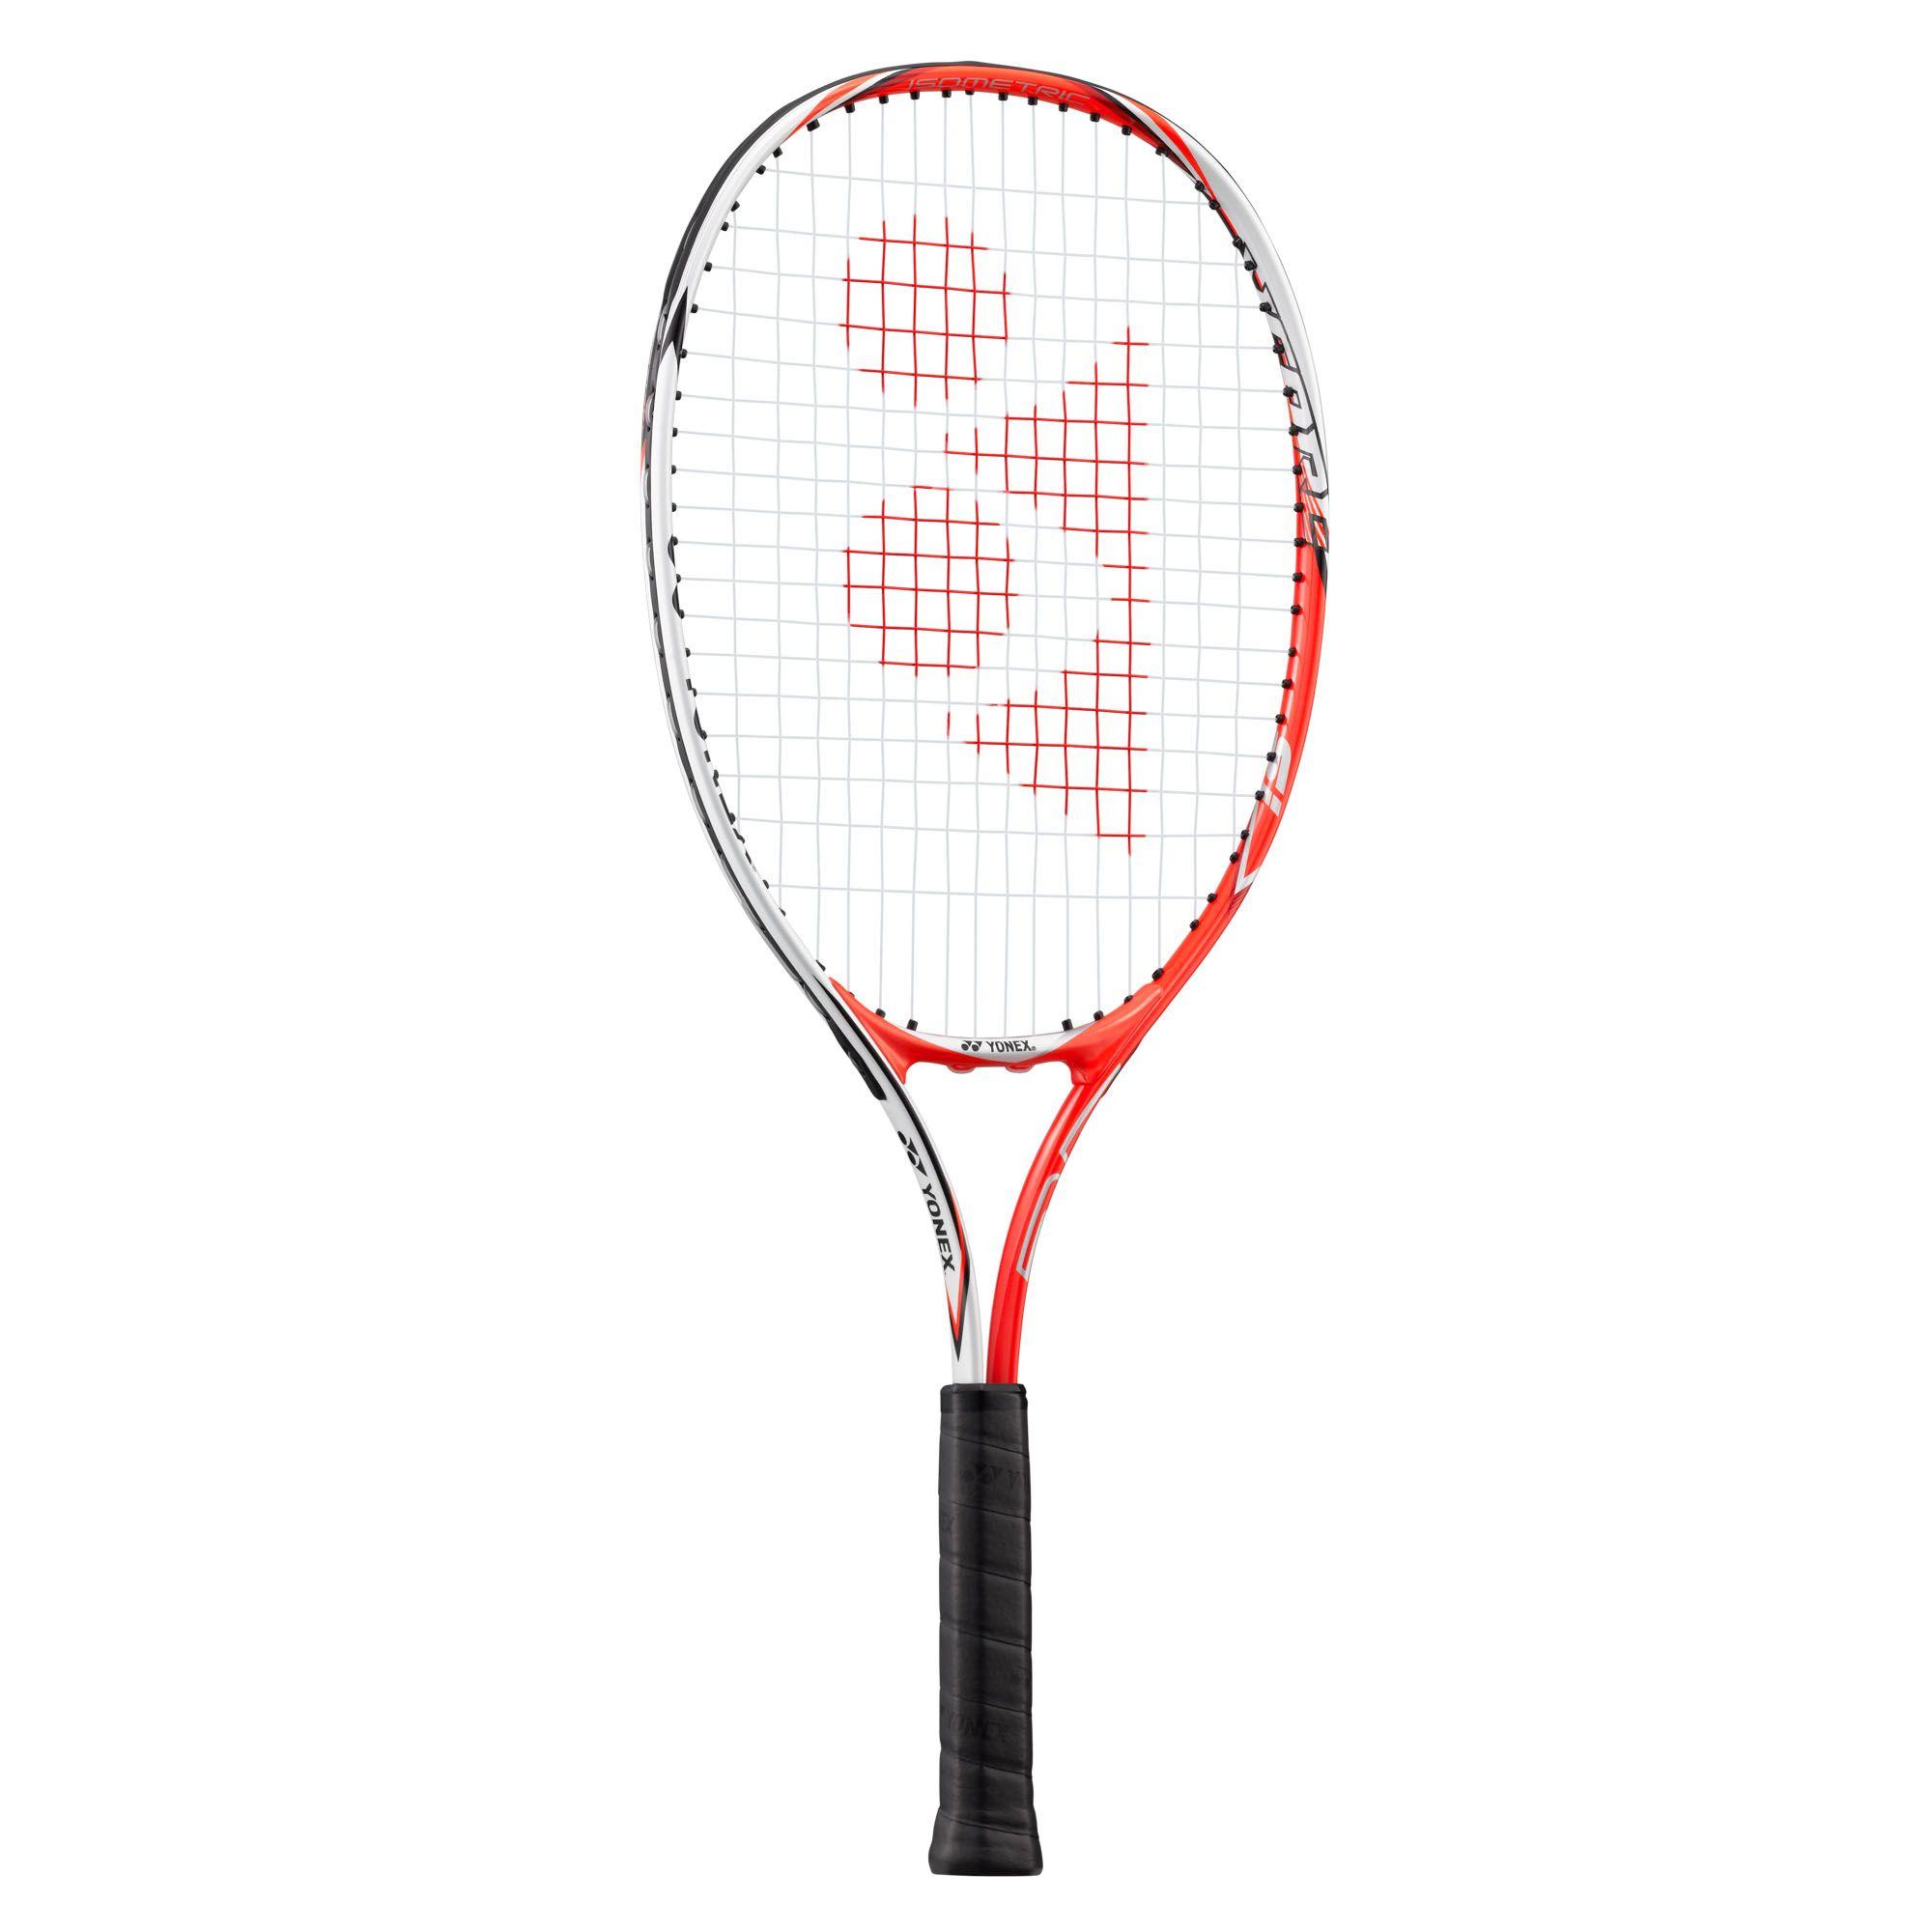 Pin by Arslan Khan on SPORTS GOOD | Tennis, Tennis racket